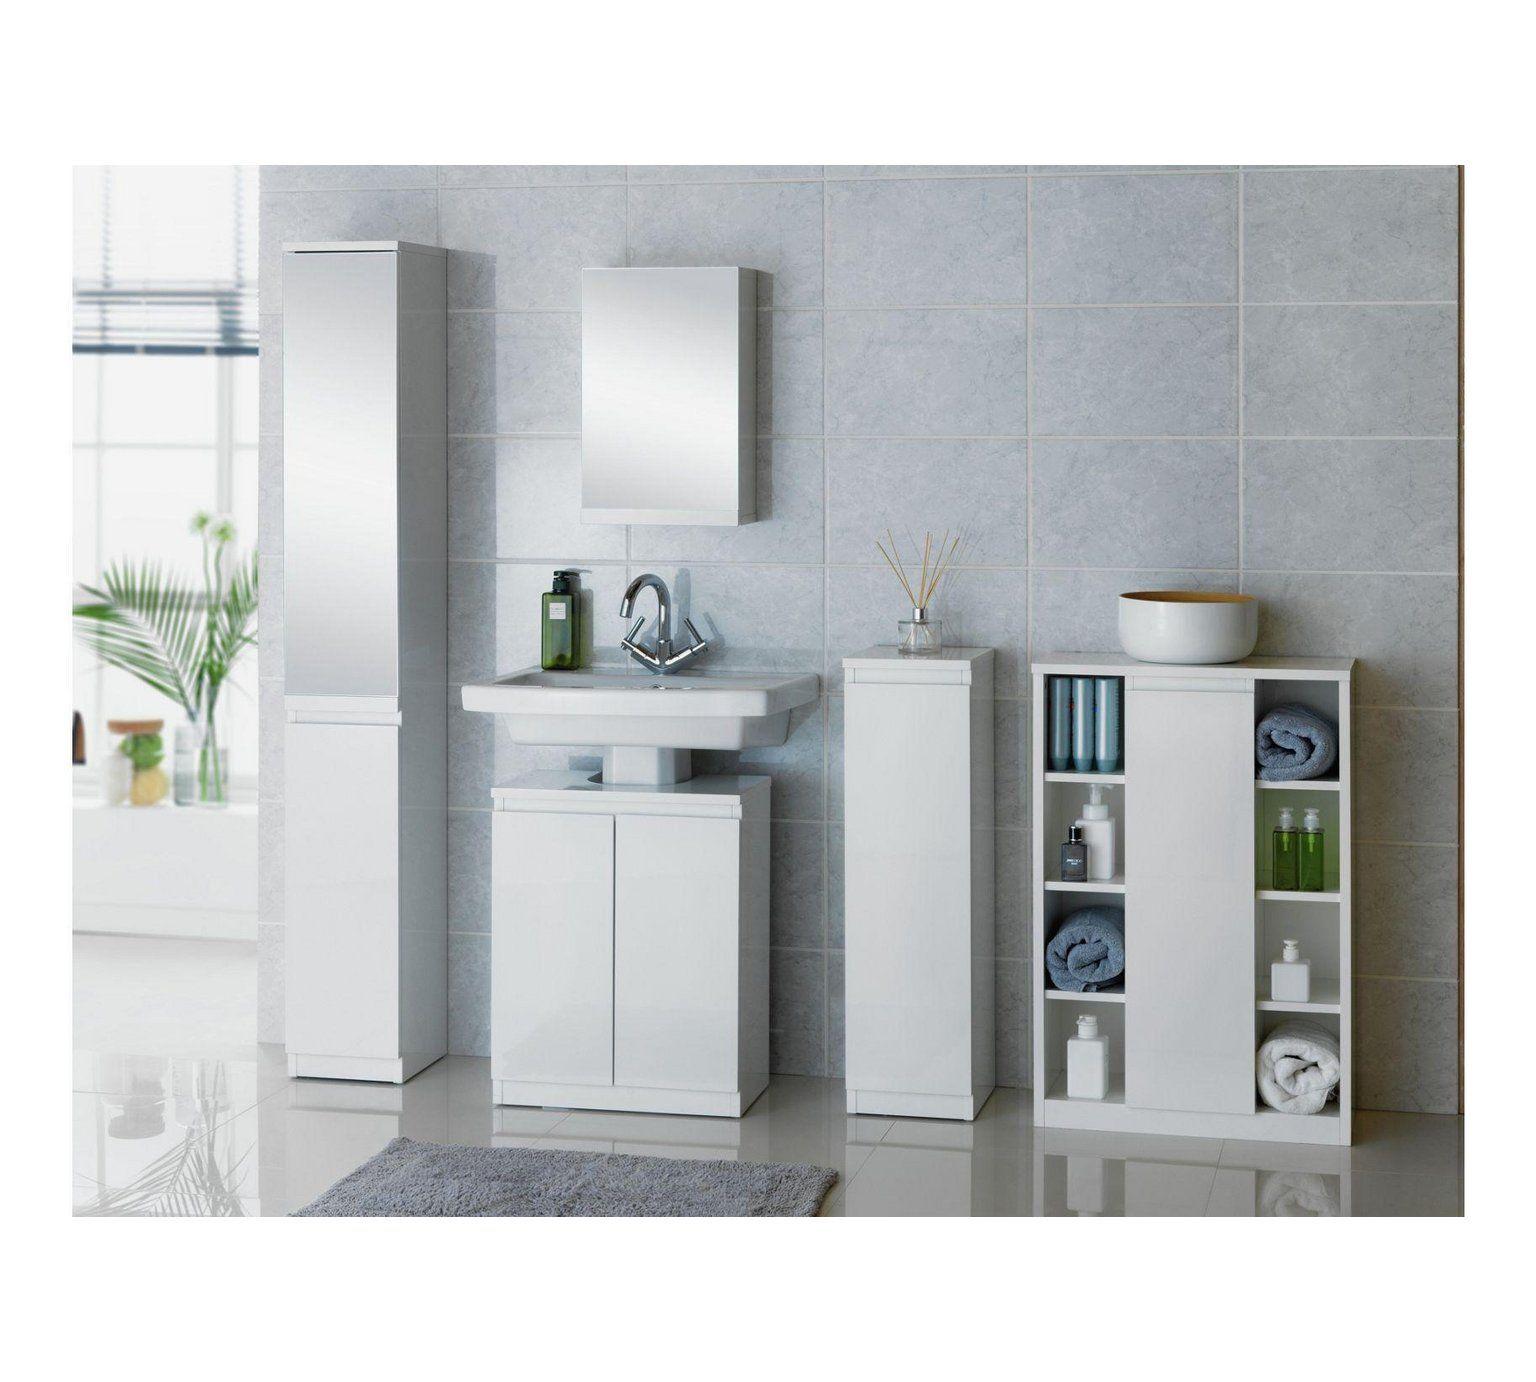 Buy Hygena Gloss Console Storage Cabinet White At Argos Co Uk Visit Argos Co Uk To Shop Online F Bathroom Floor Cabinets White Bathroom Furniture Argos Home